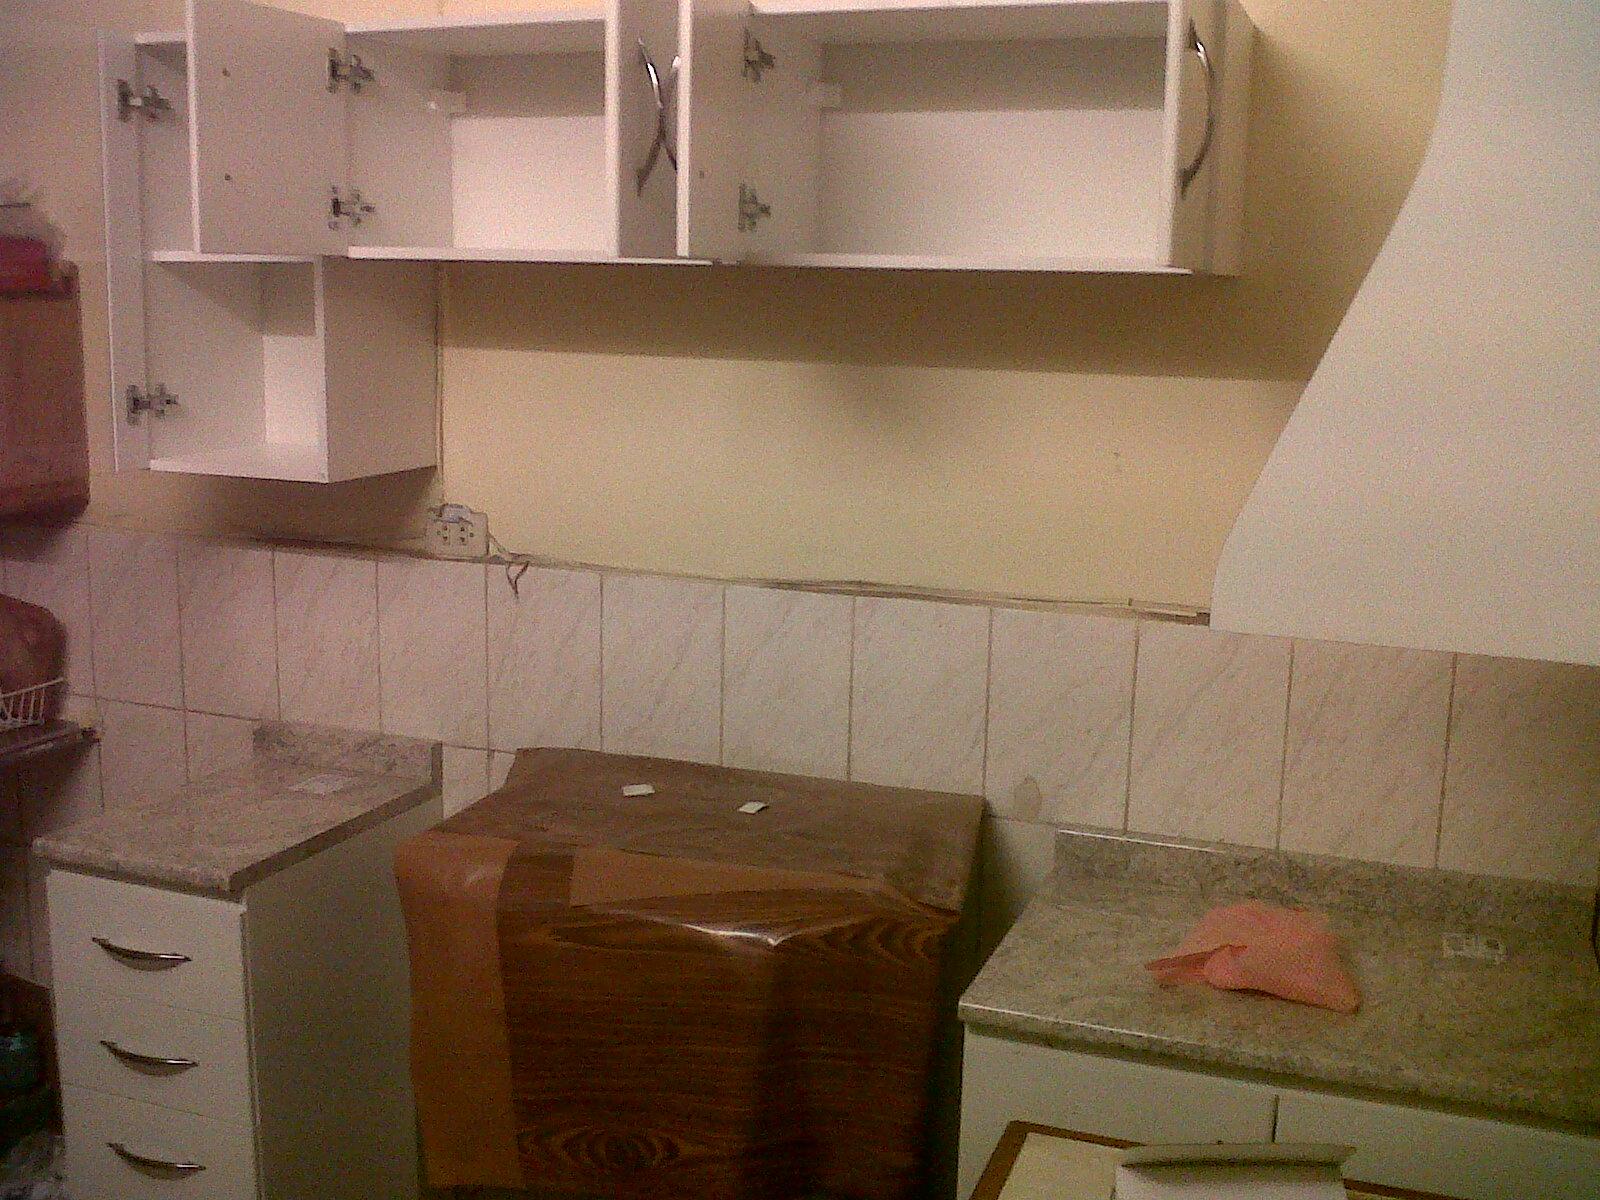 Muebles Sodimac Homecenter Obtenga Ideas Dise 241 O De